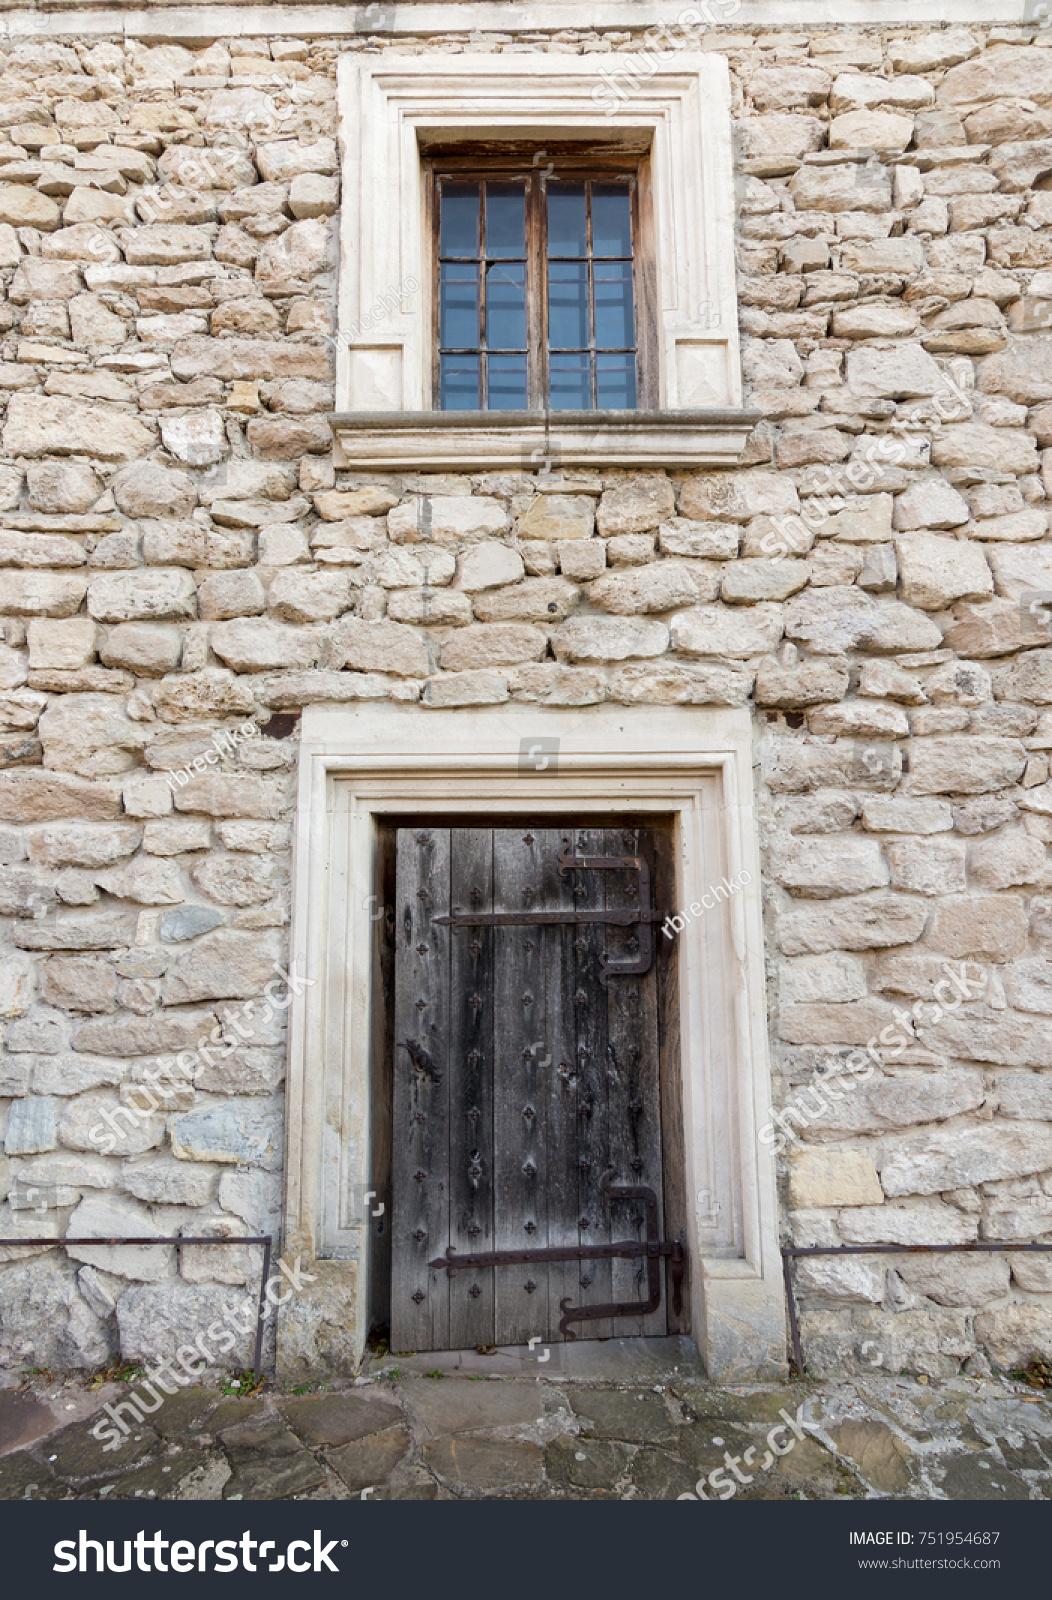 Vintage Decorative Window Door Ornate Iron Buildings